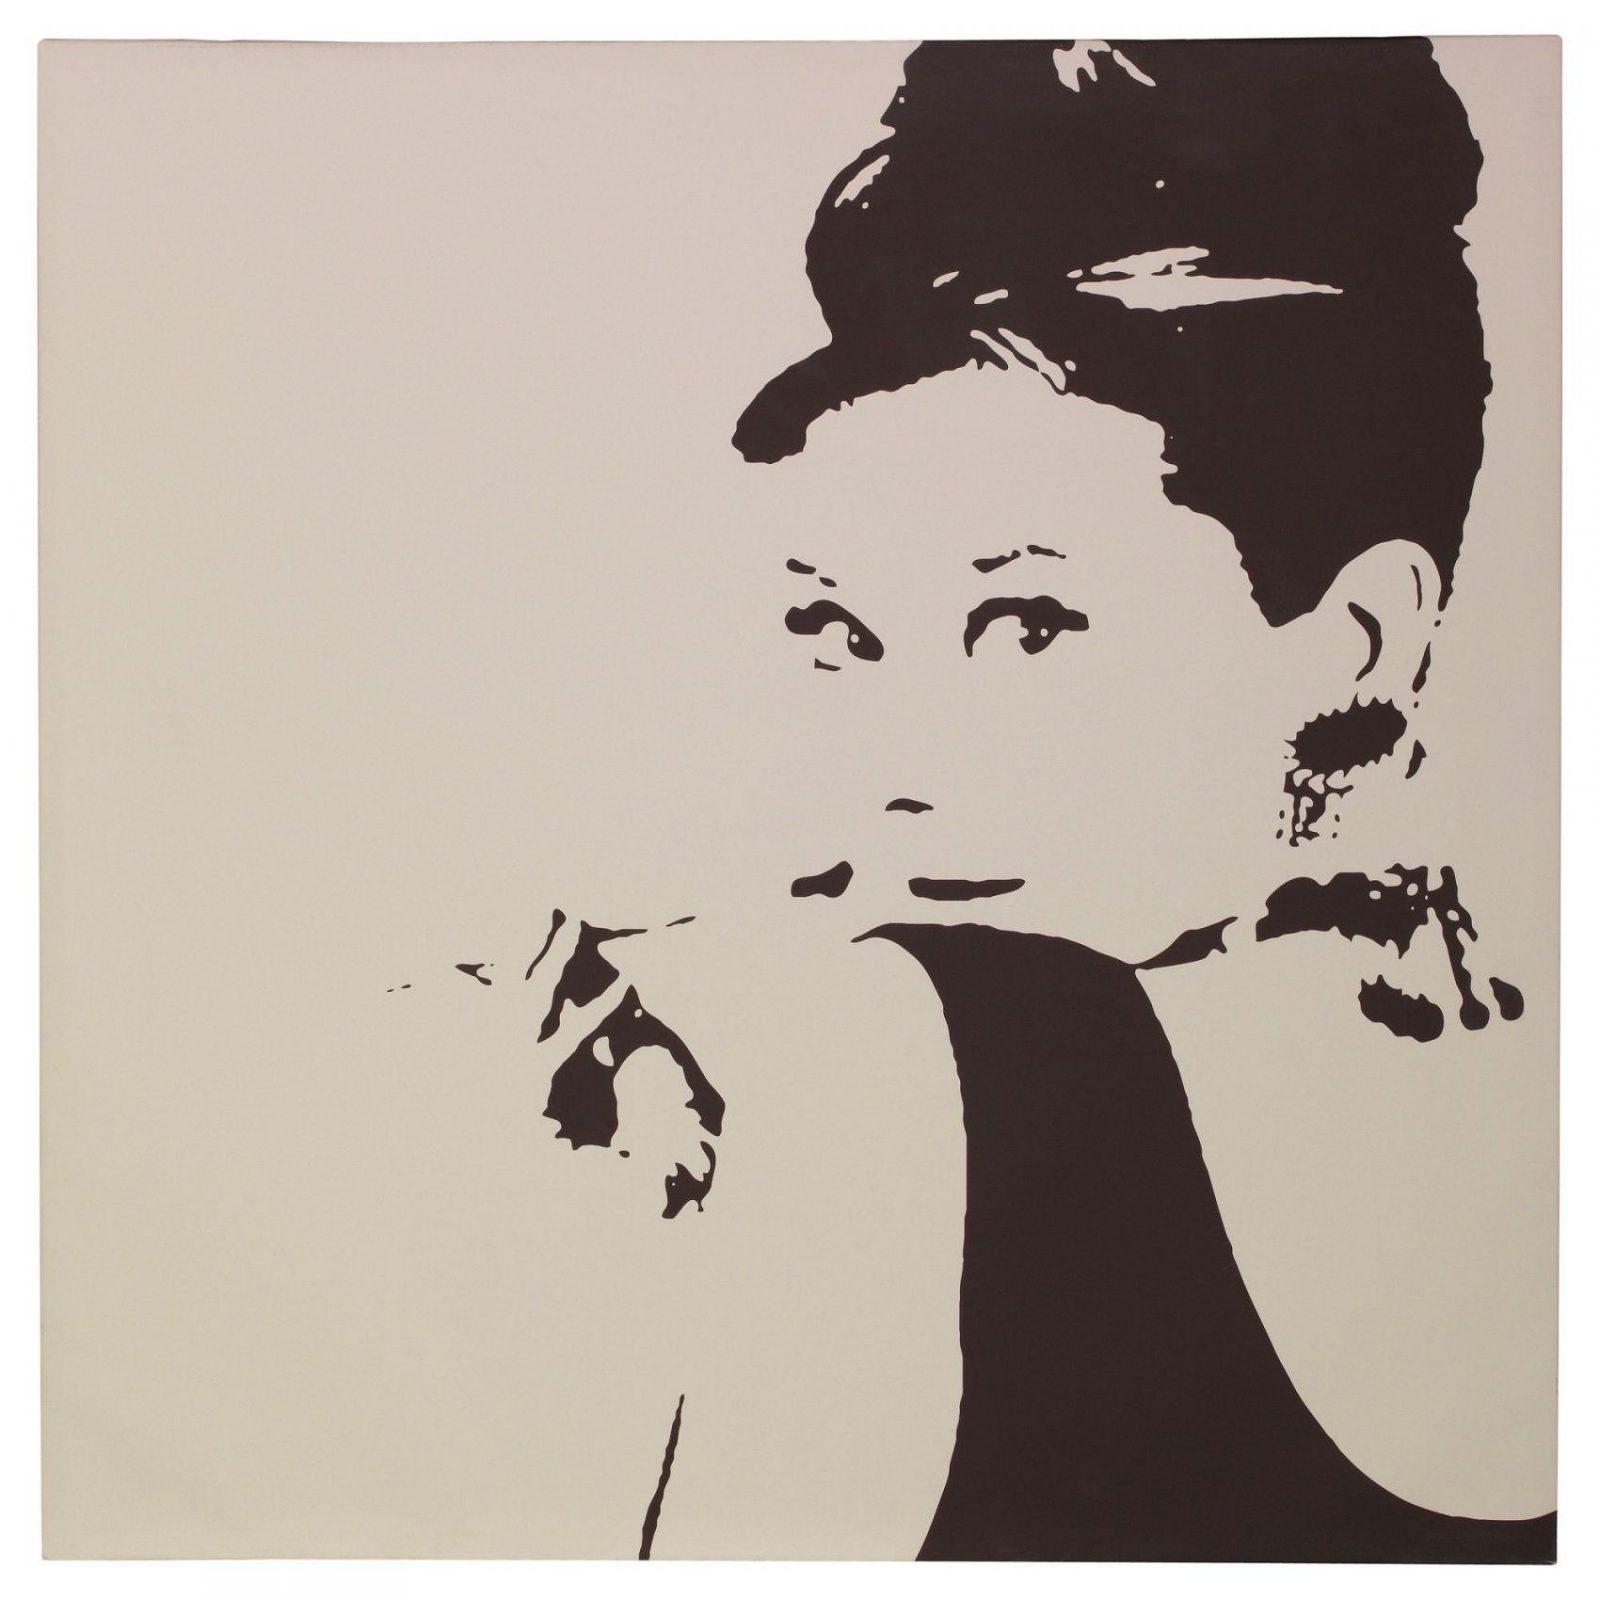 Pjätteryd Bild  Ikea  Audrey Hepburn  Pinterest  Audrey Hepburn von Audrey Hepburn Bild Ikea Bild